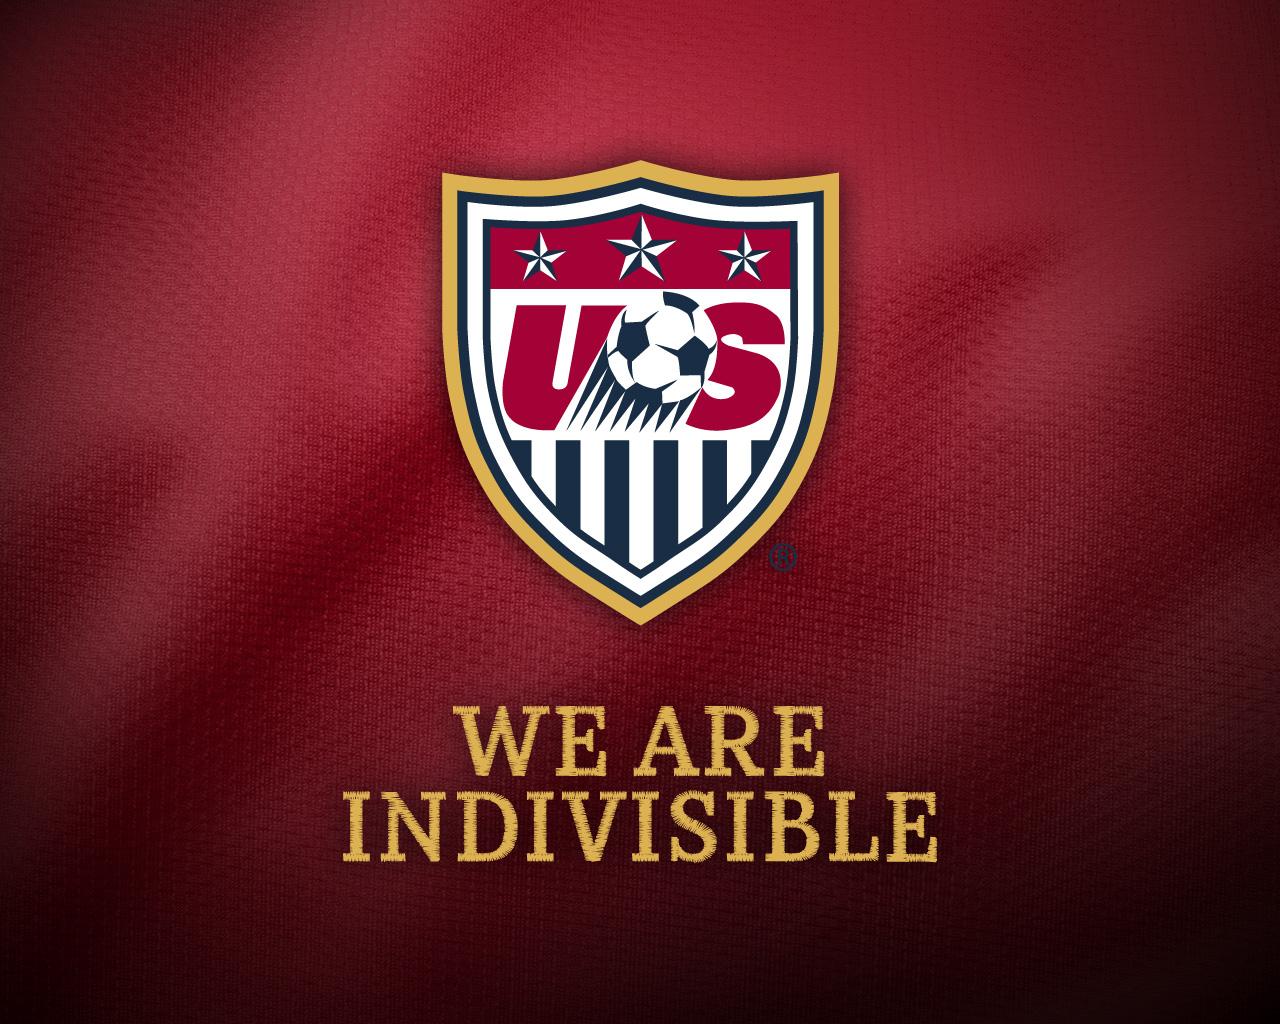 U S Soccer Wallpapers 1280x1024 px 544Y7PH   4USkY 1280x1024